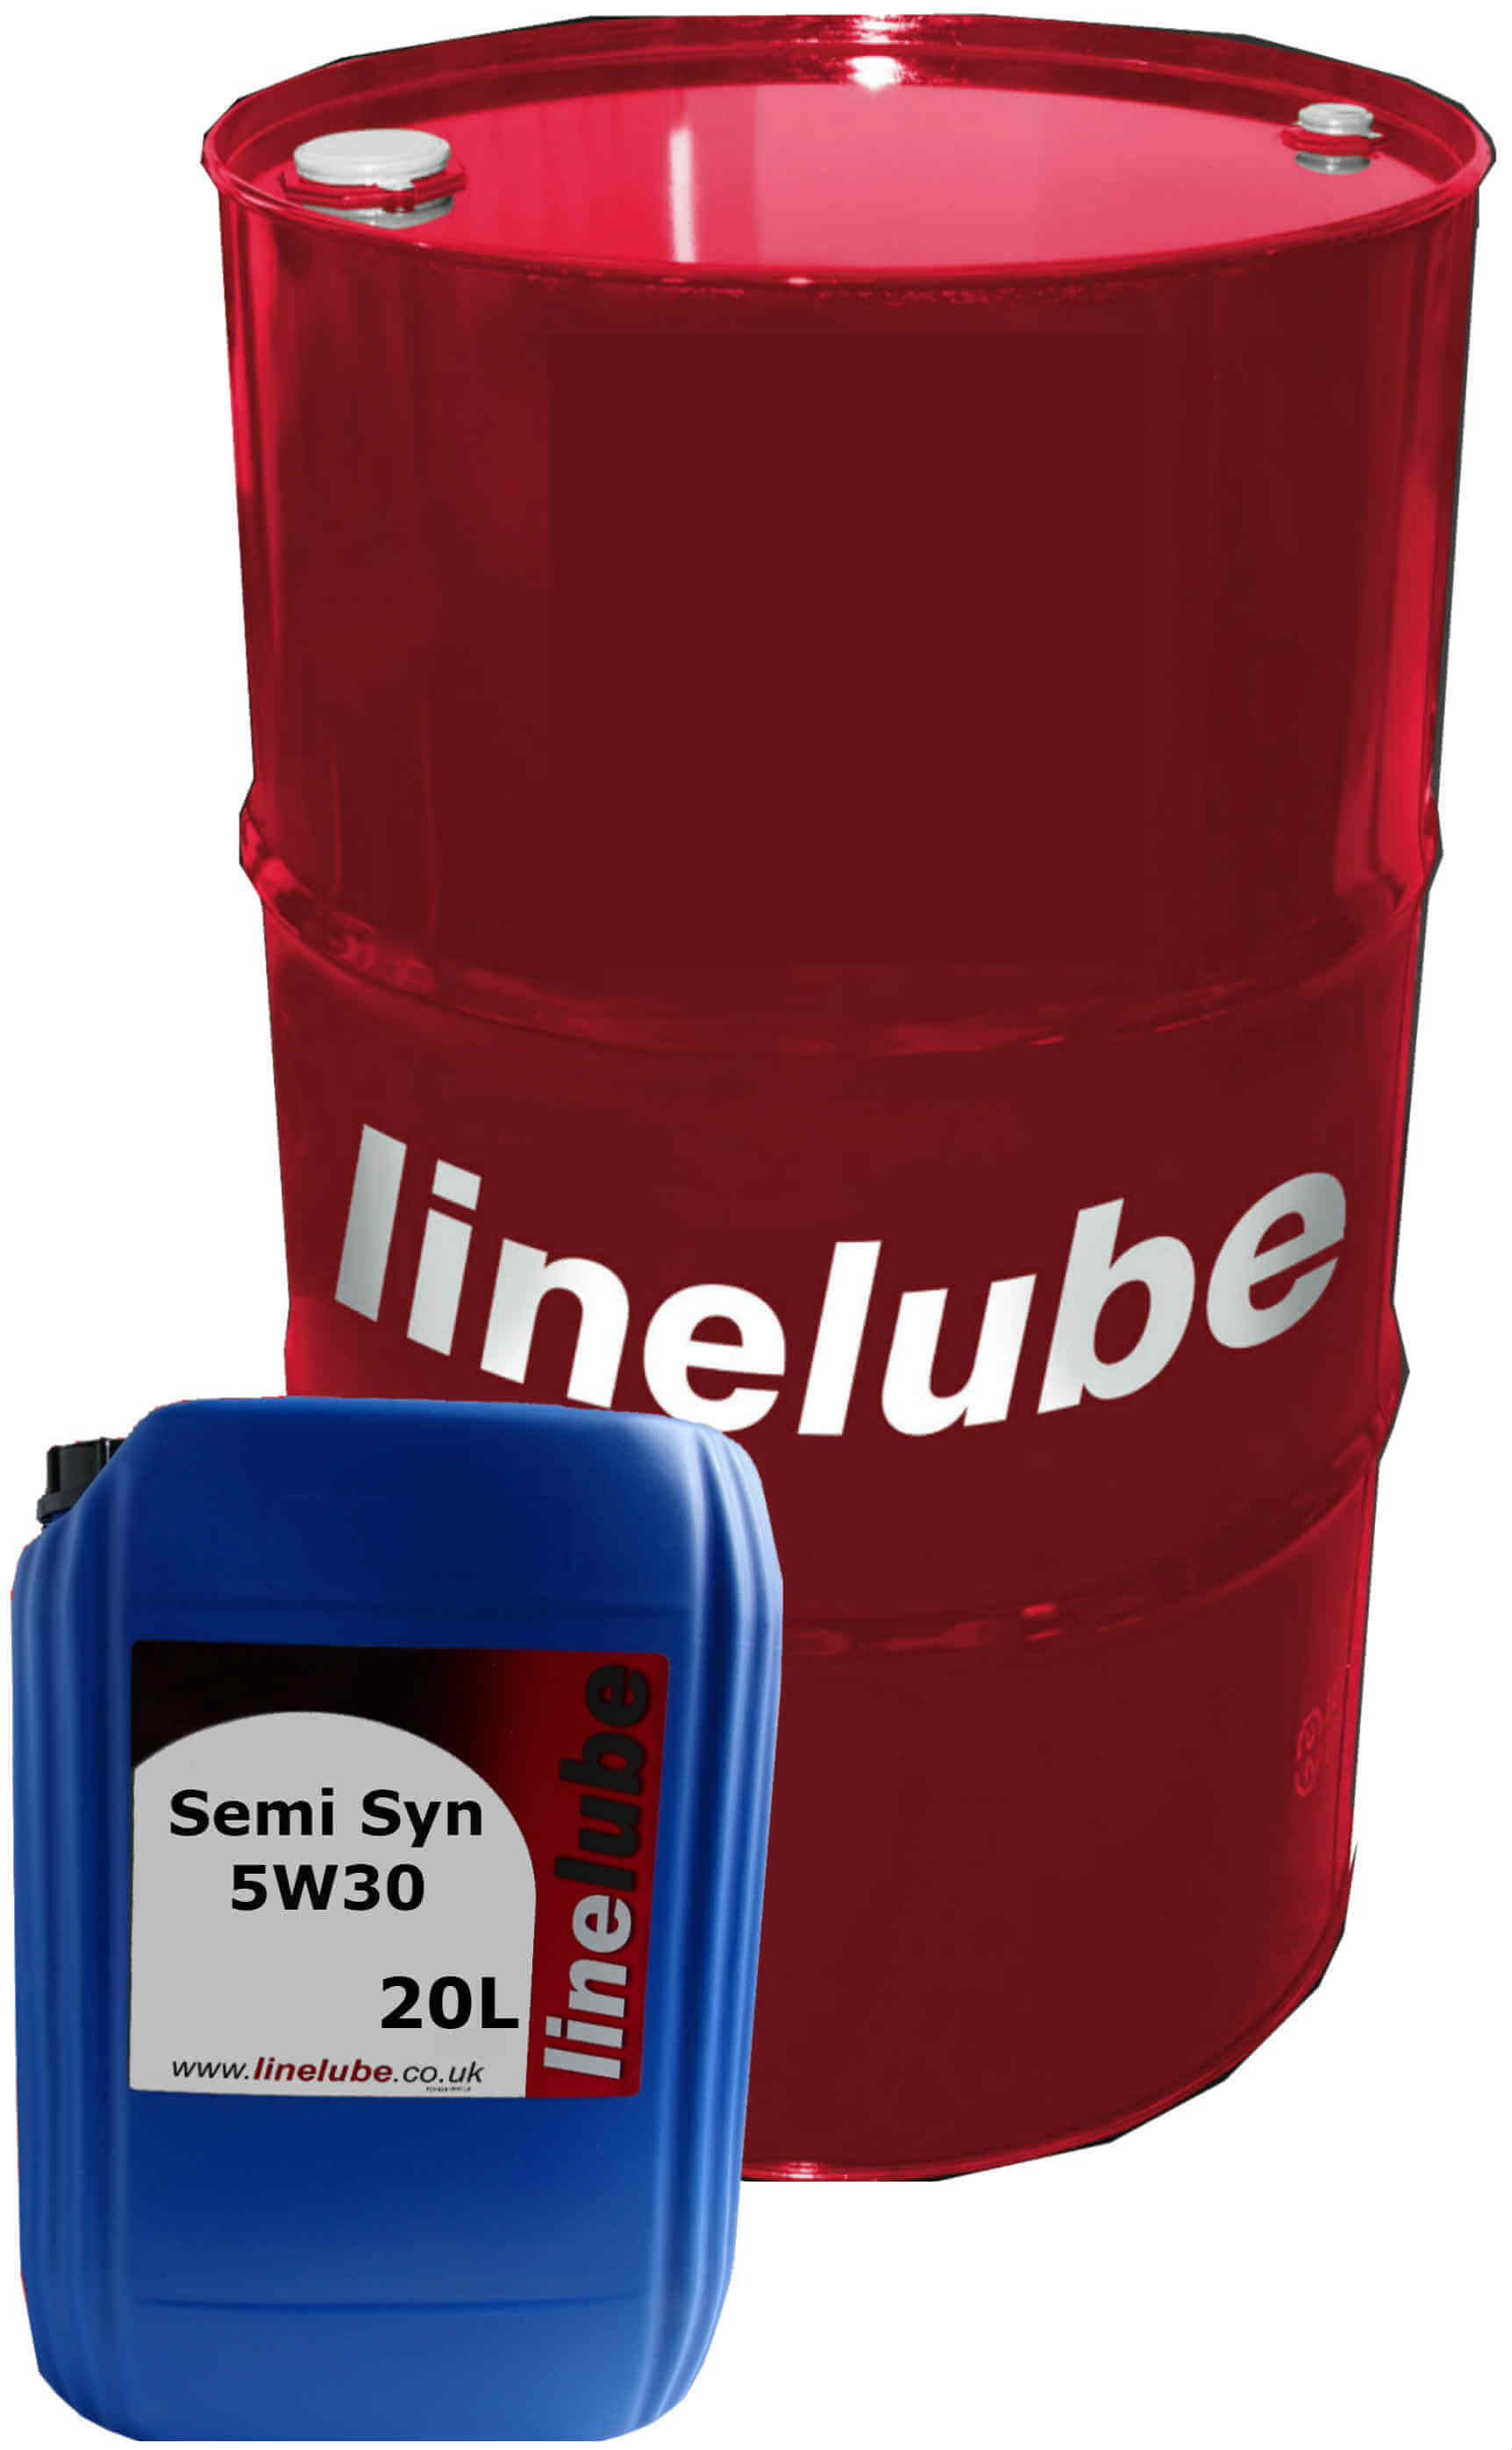 Linelube Semi Syn 5W-30